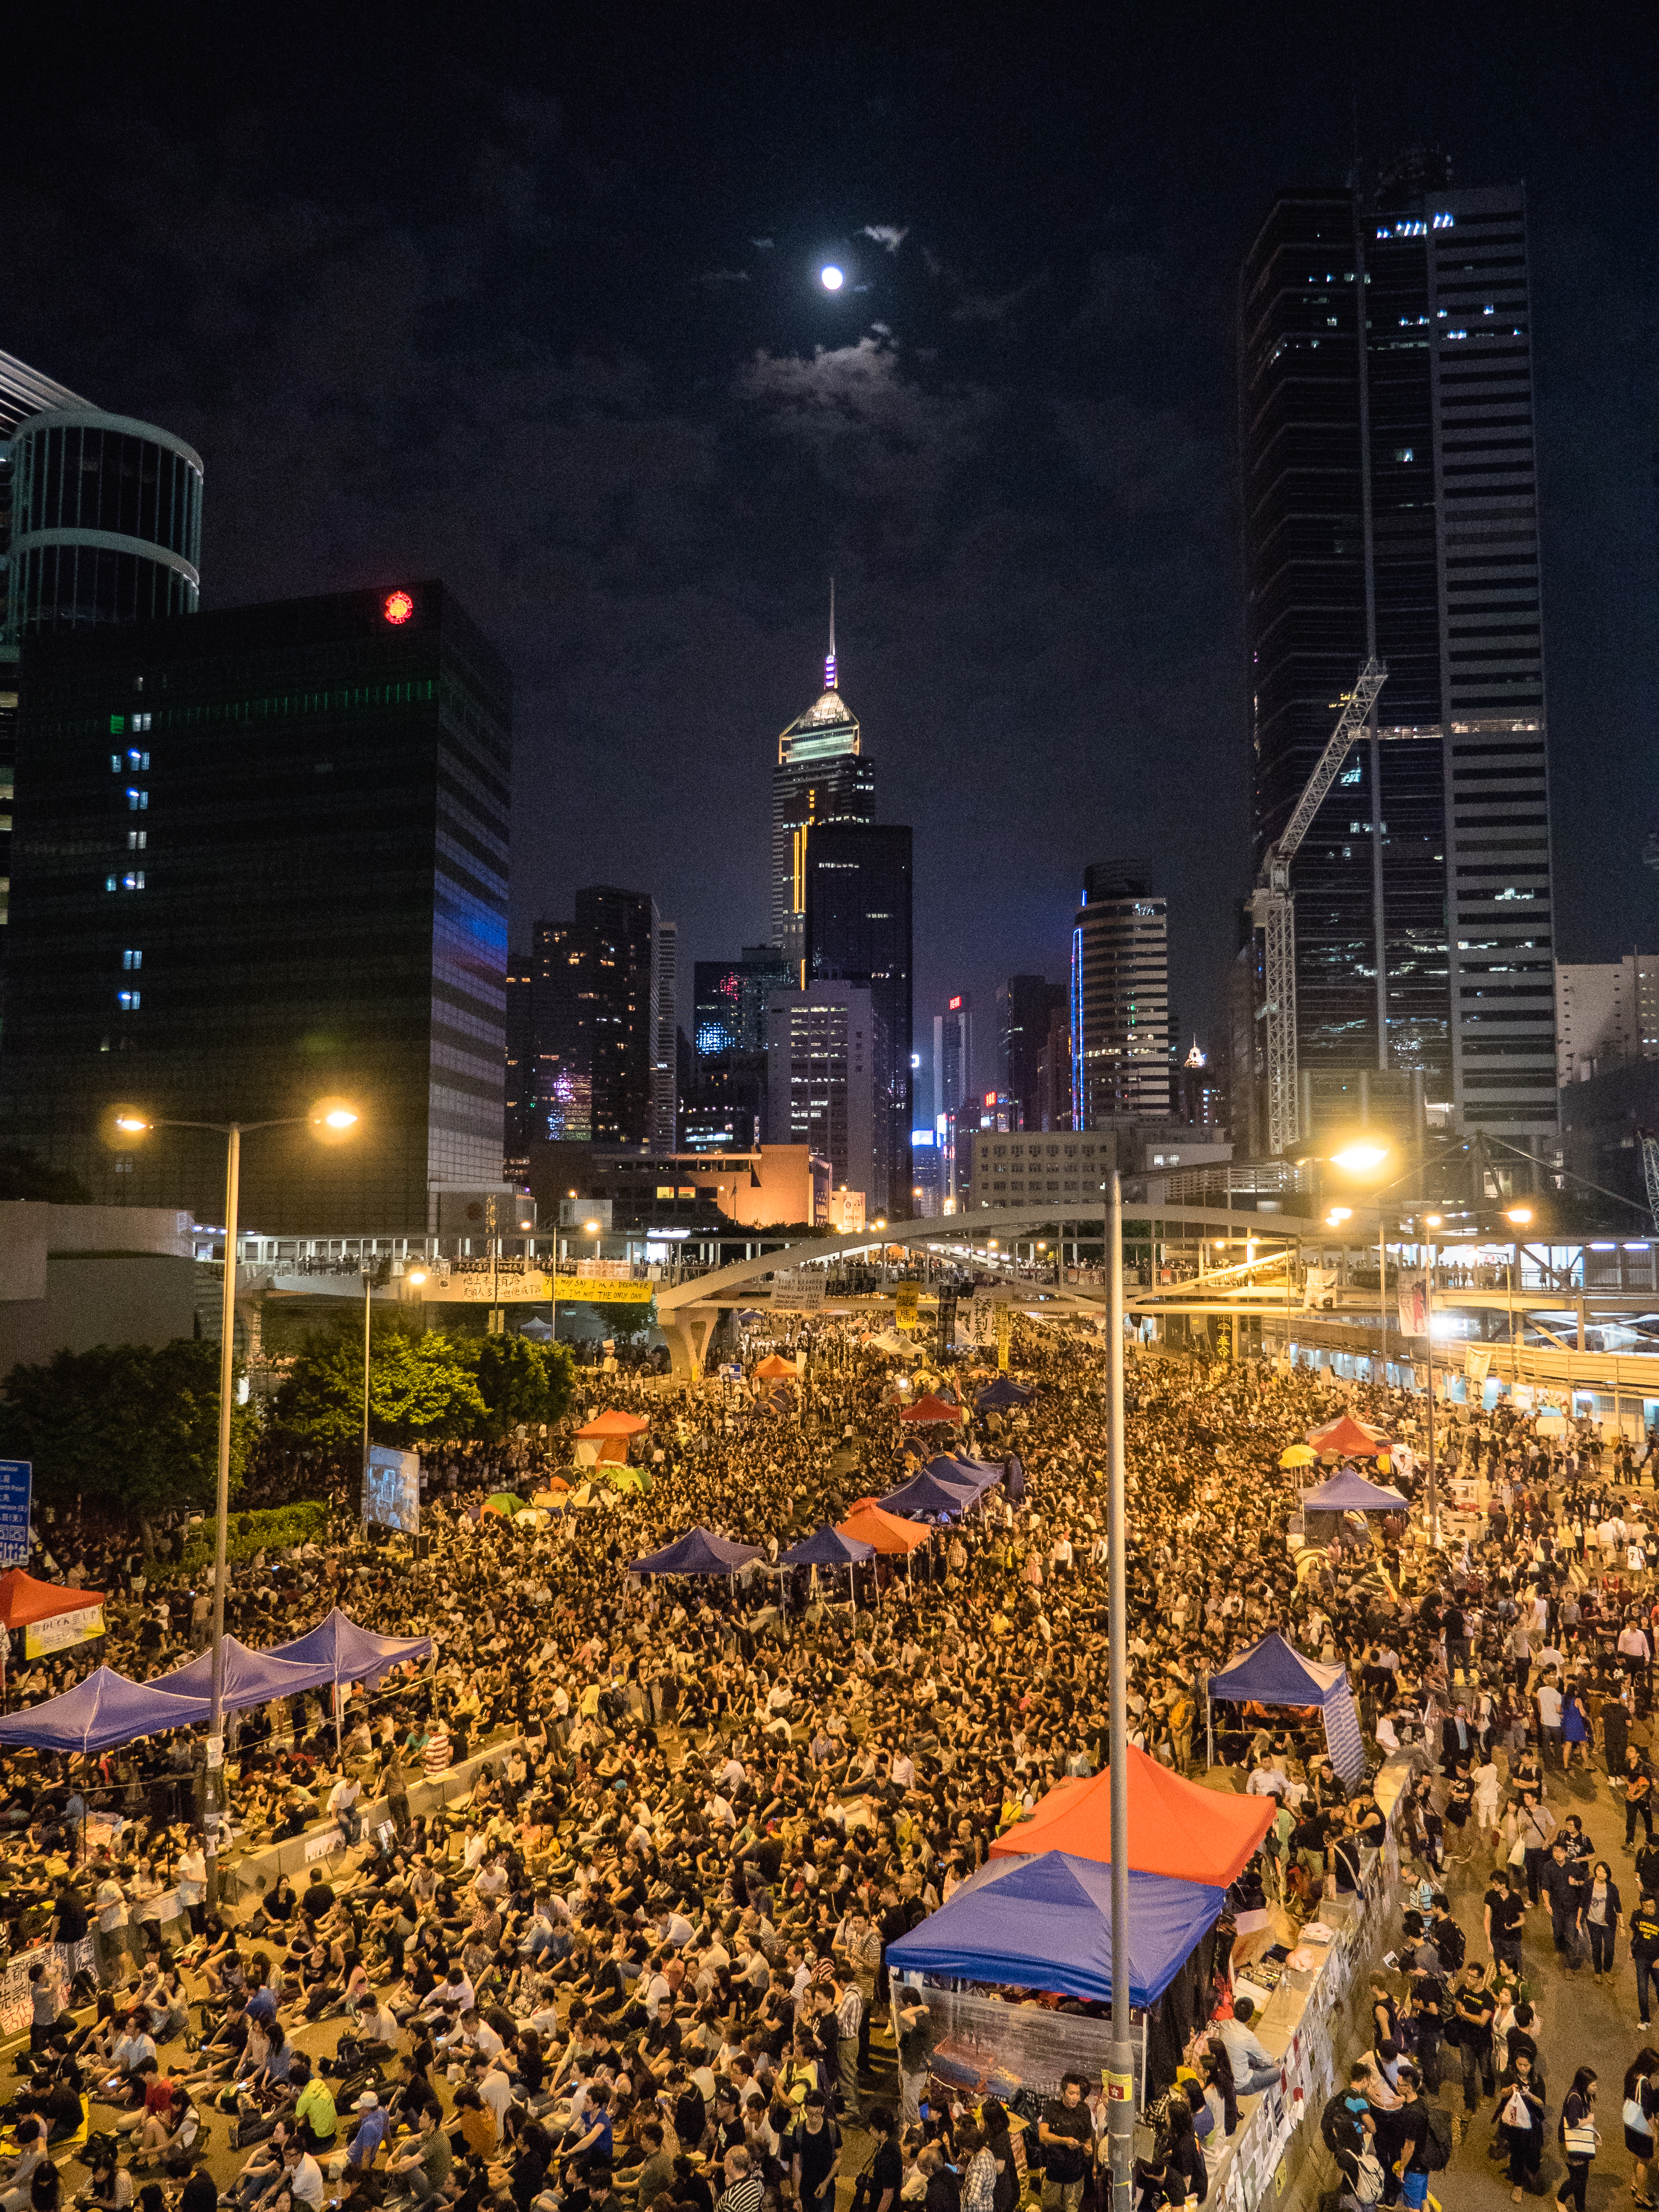 https://upload.wikimedia.org/wikipedia/commons/7/7b/Umbrella_Revolution_in_Admiralty_Night_View_20141010.jpg